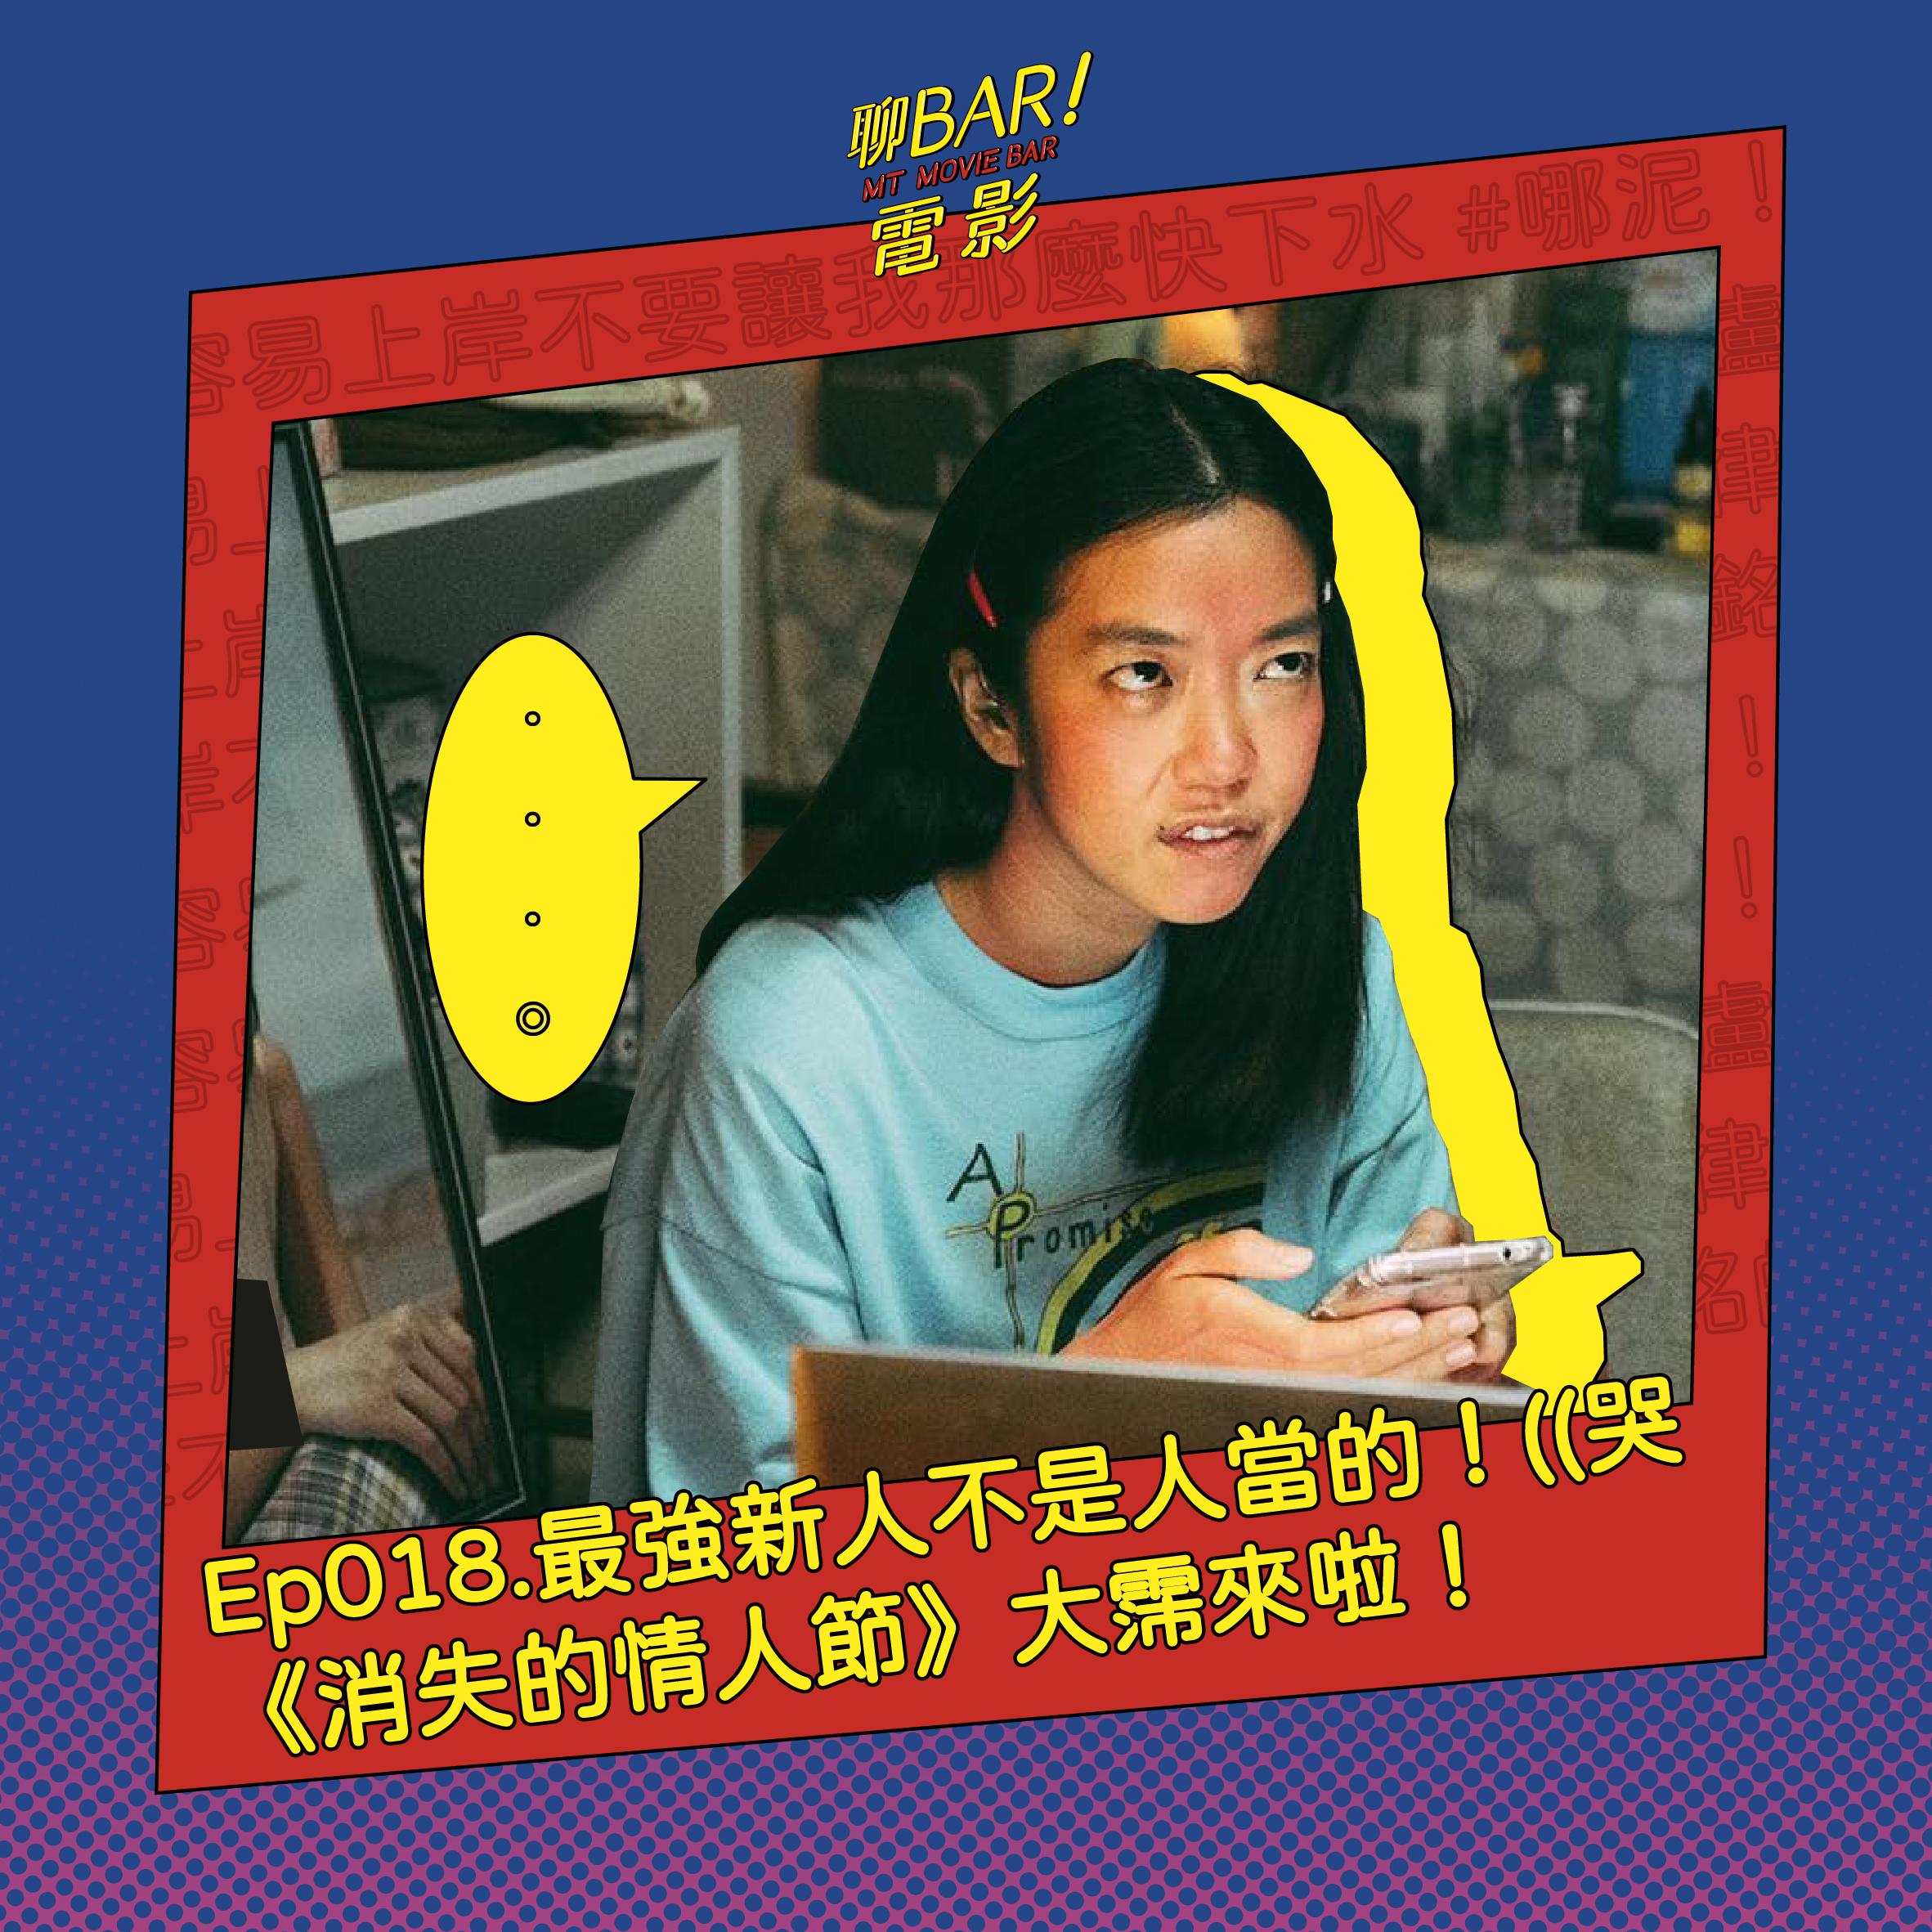 ep.018【聊Bar大來賓】最強新人不是人當的!(哭)《#消失的情人節》大霈來拉!